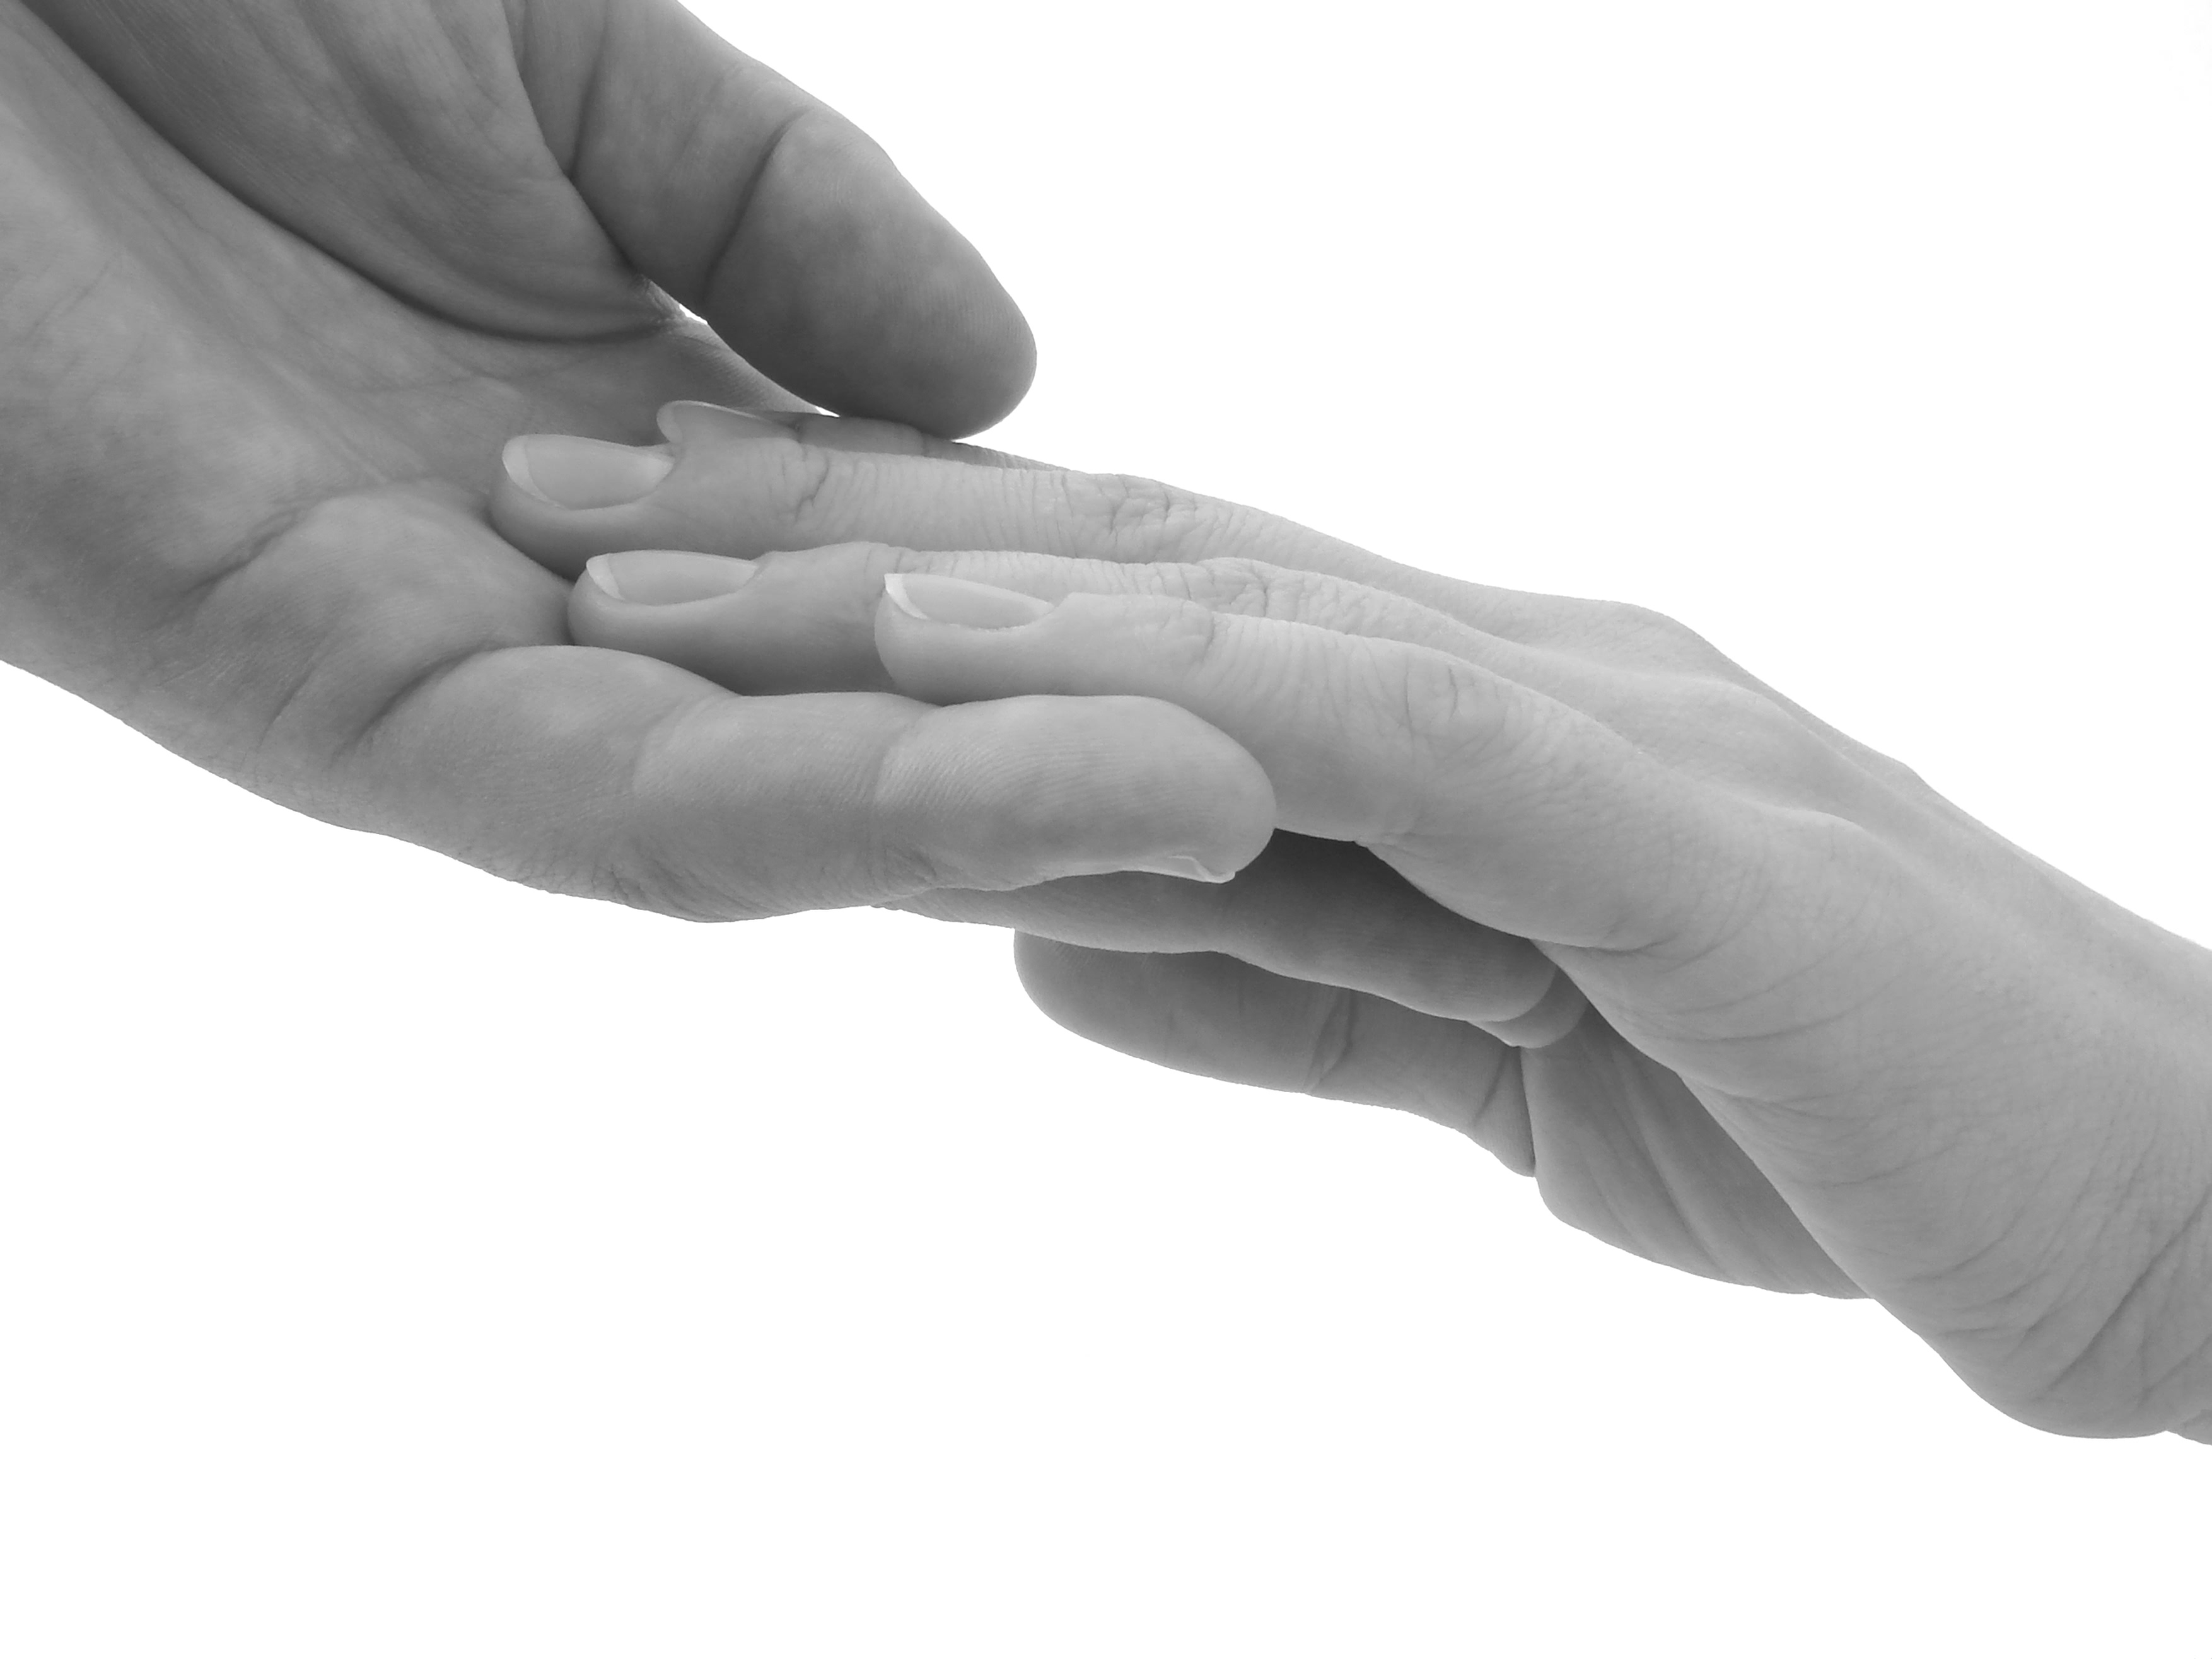 About Intercessory Prayer